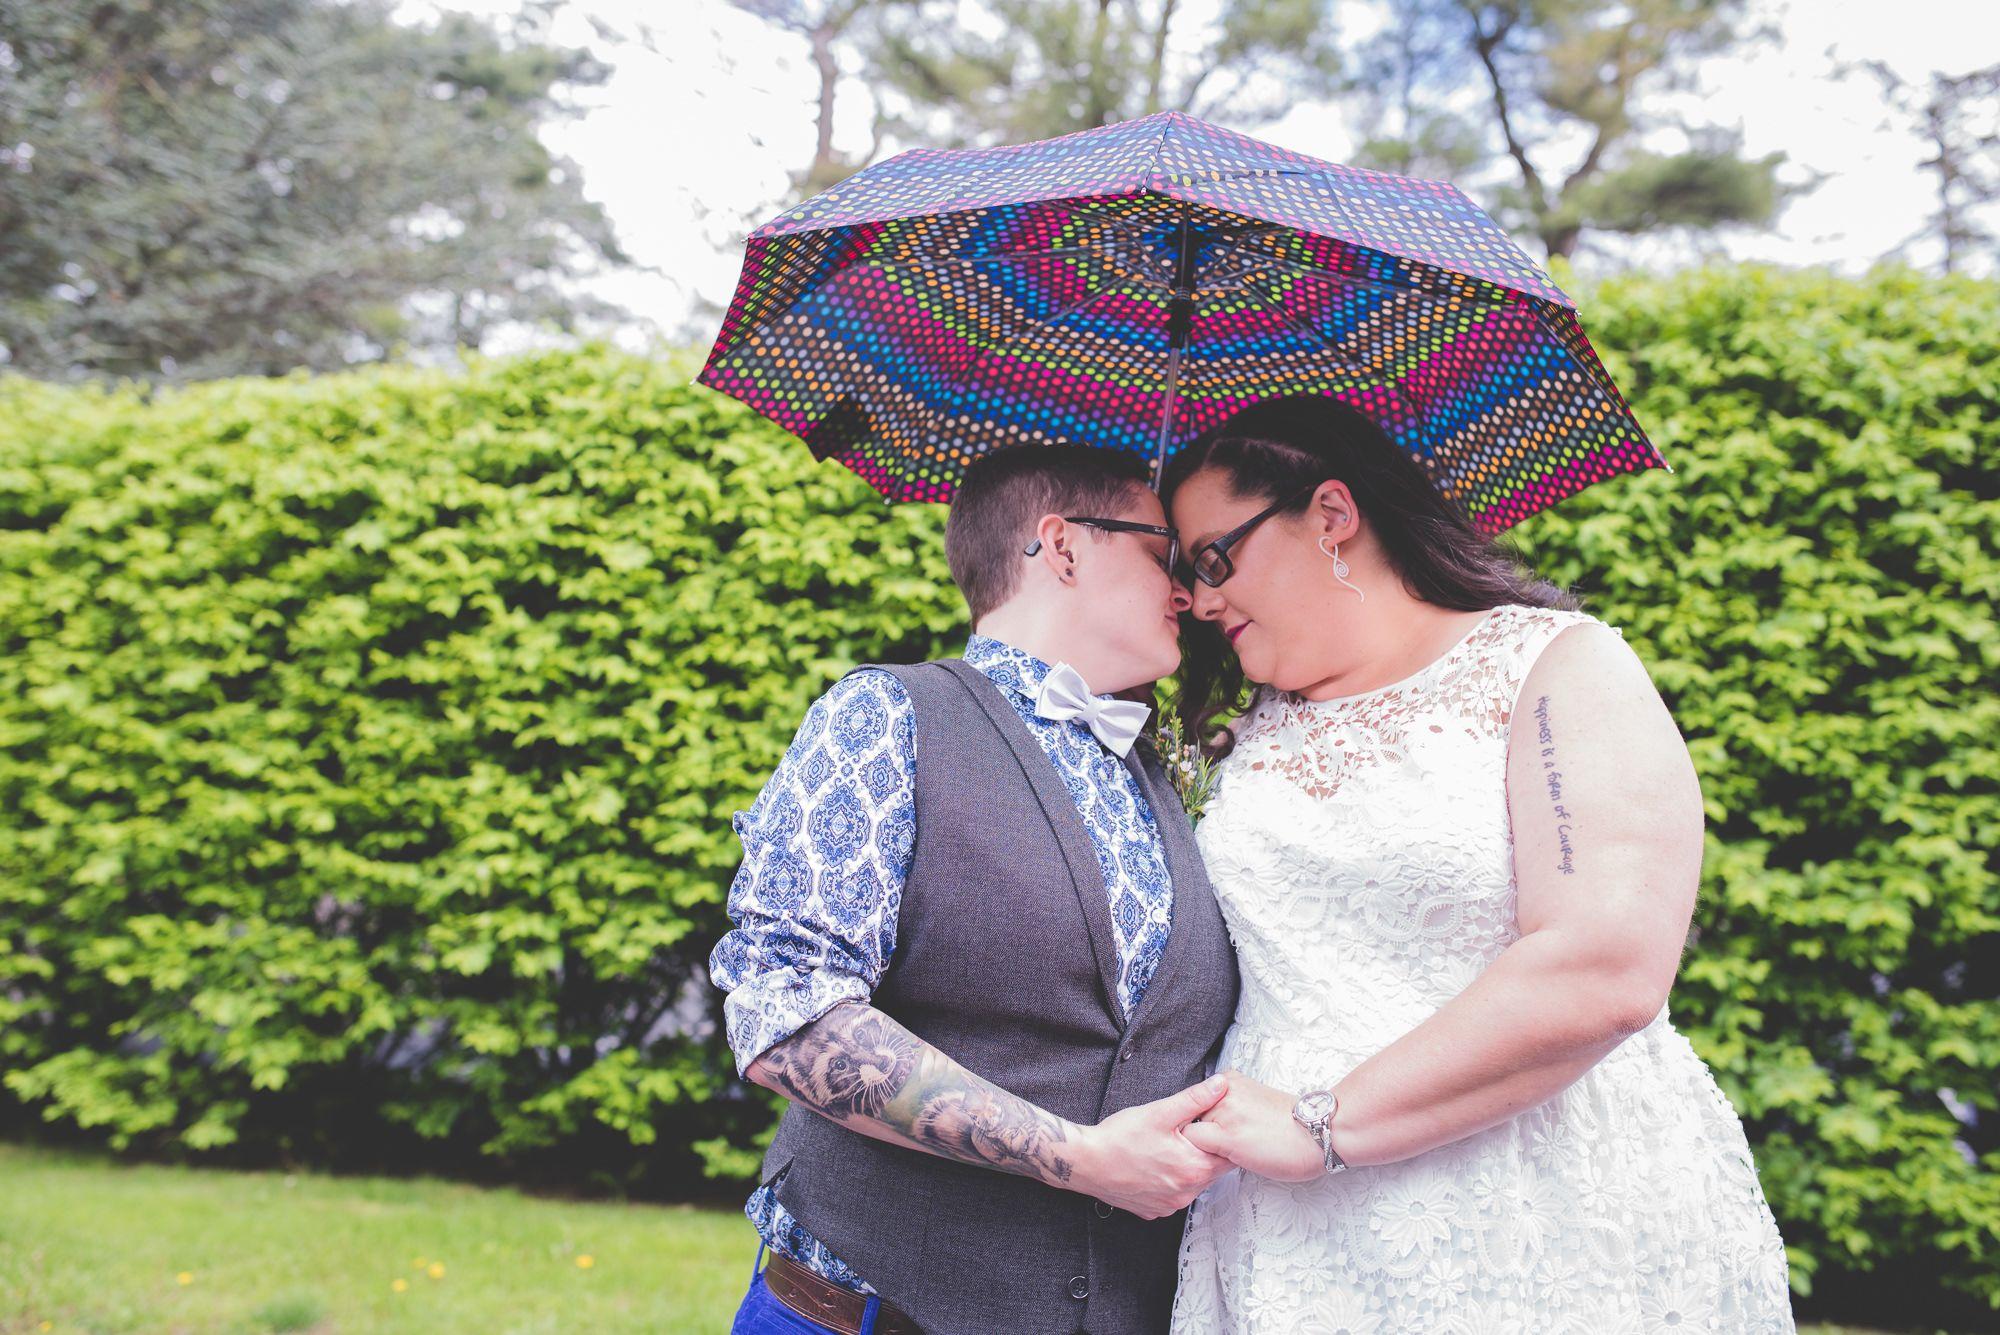 Cheri + Rachel's Same Sex Morris Museum Wedding || New Jersey Weddings || BG Productions Photography || www.bgproonline.com #rainydaywedding #rainbowumbrella #photoswithumbrellas #staydryweddingphotos